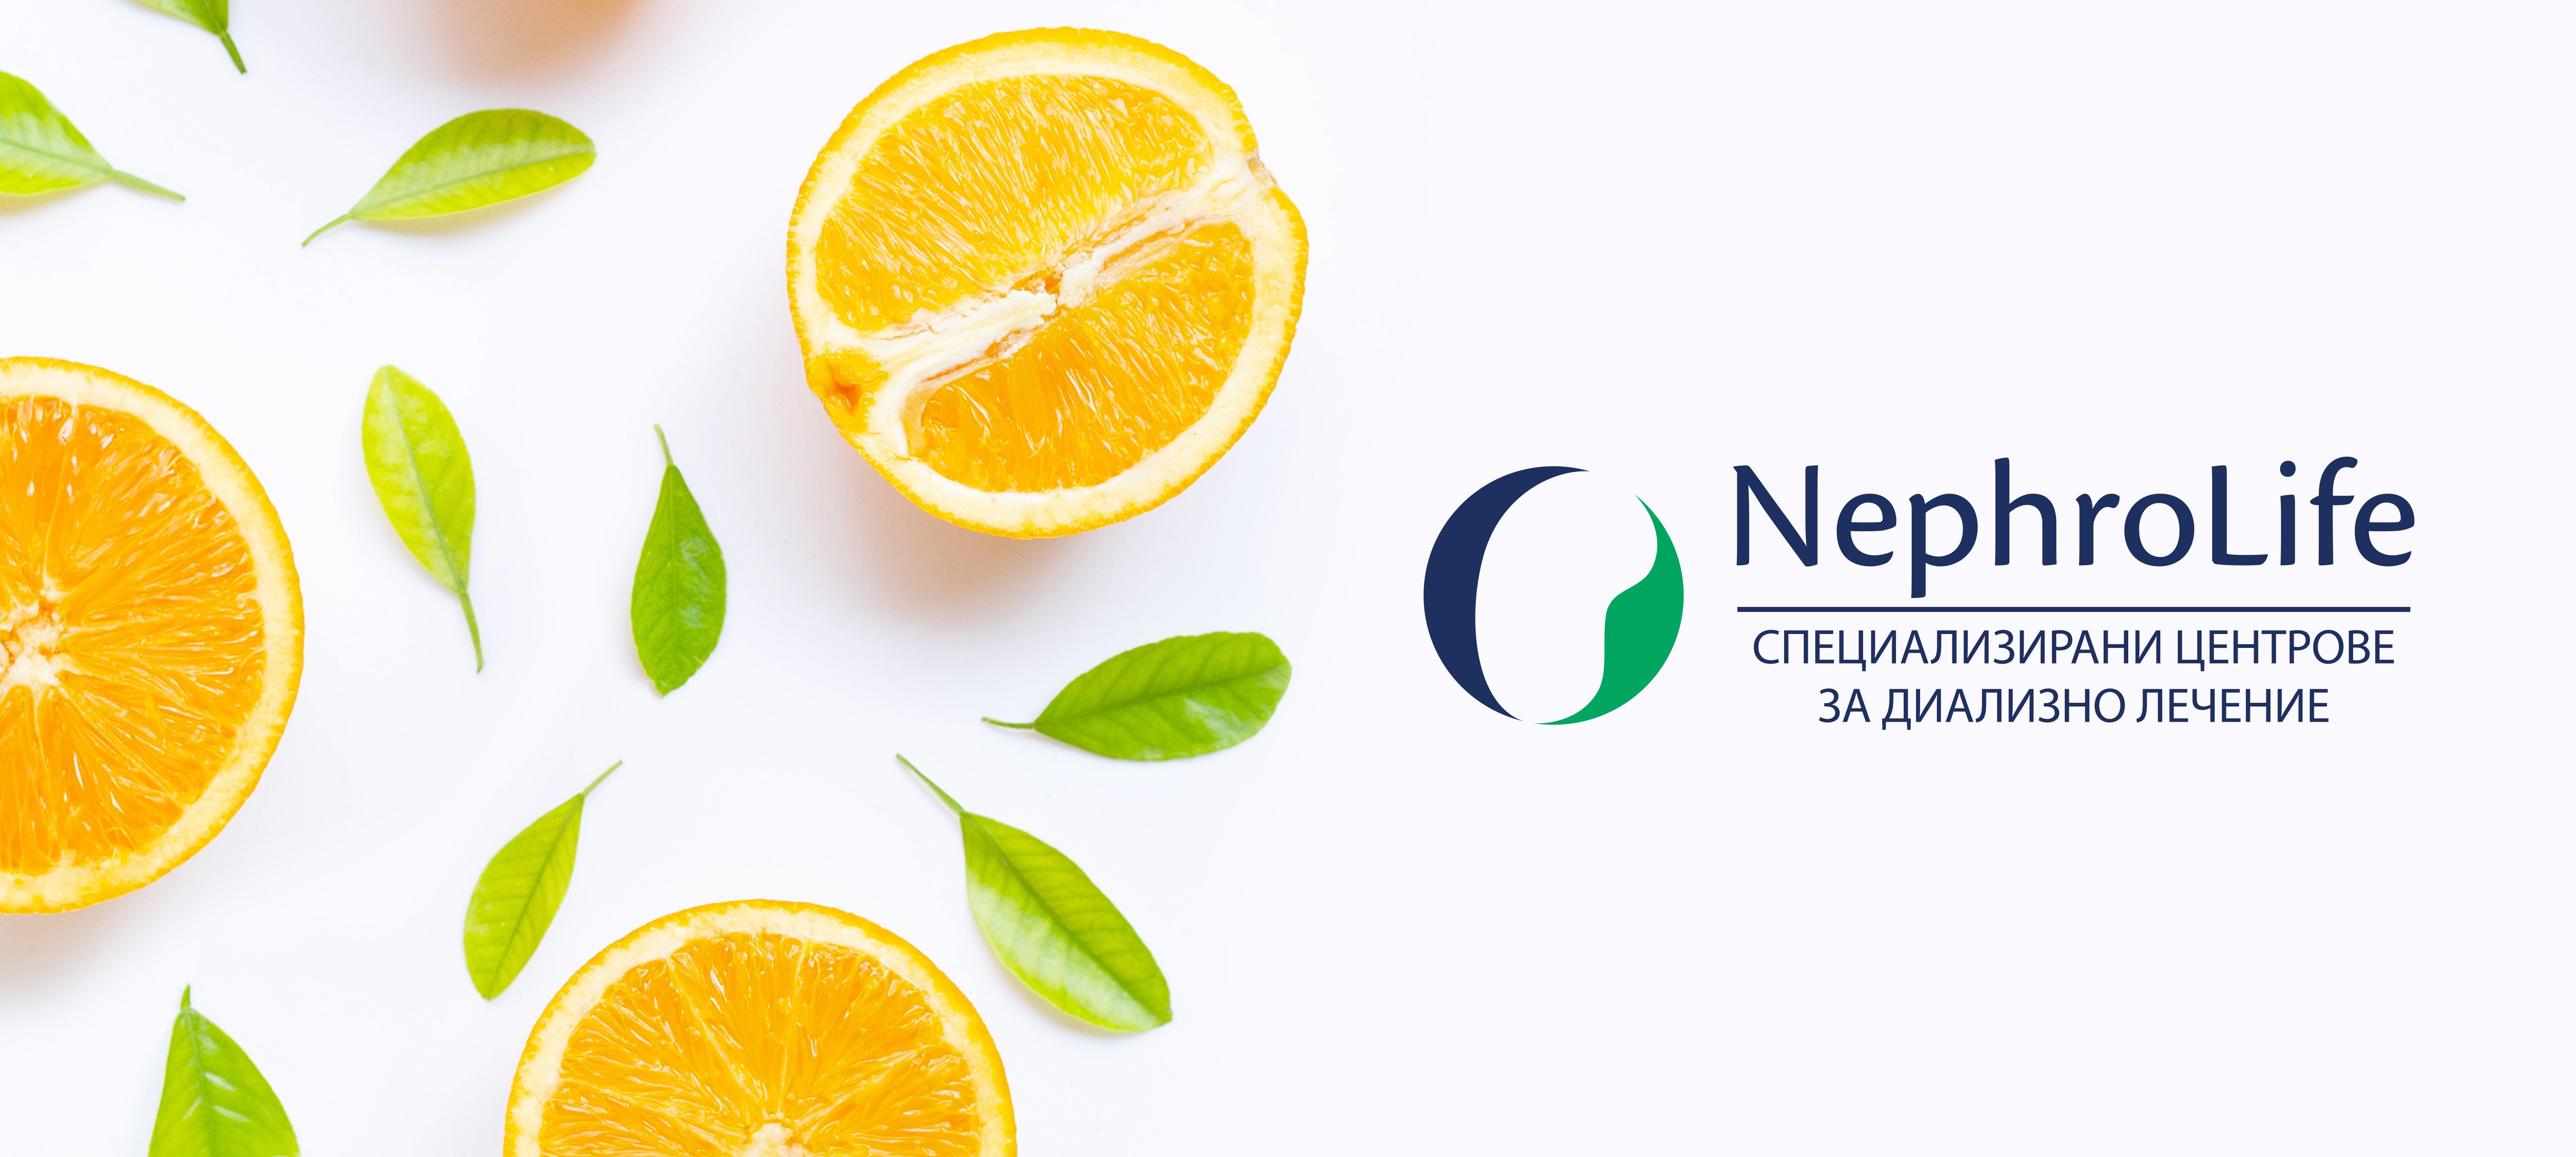 high-vitamin-c-juicy-sweet-fresh-orange-fruit-with-green-leaves-white-2-1